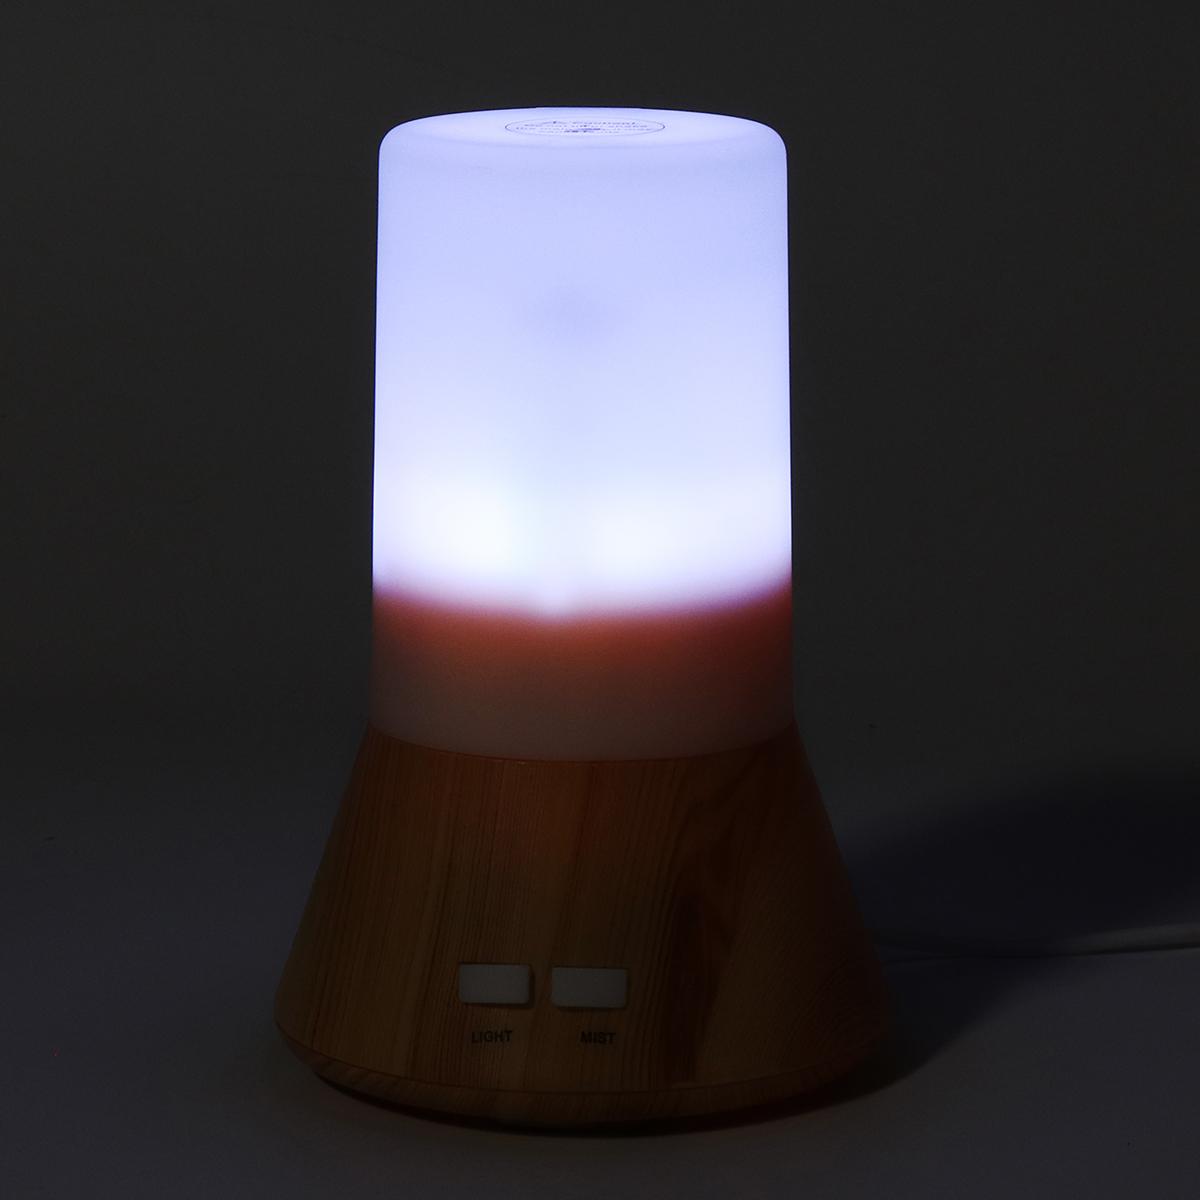 USB Aroma Humidifier Smart bluetooth Audio Colorful Lights Automatic Wood Fragrance Machine